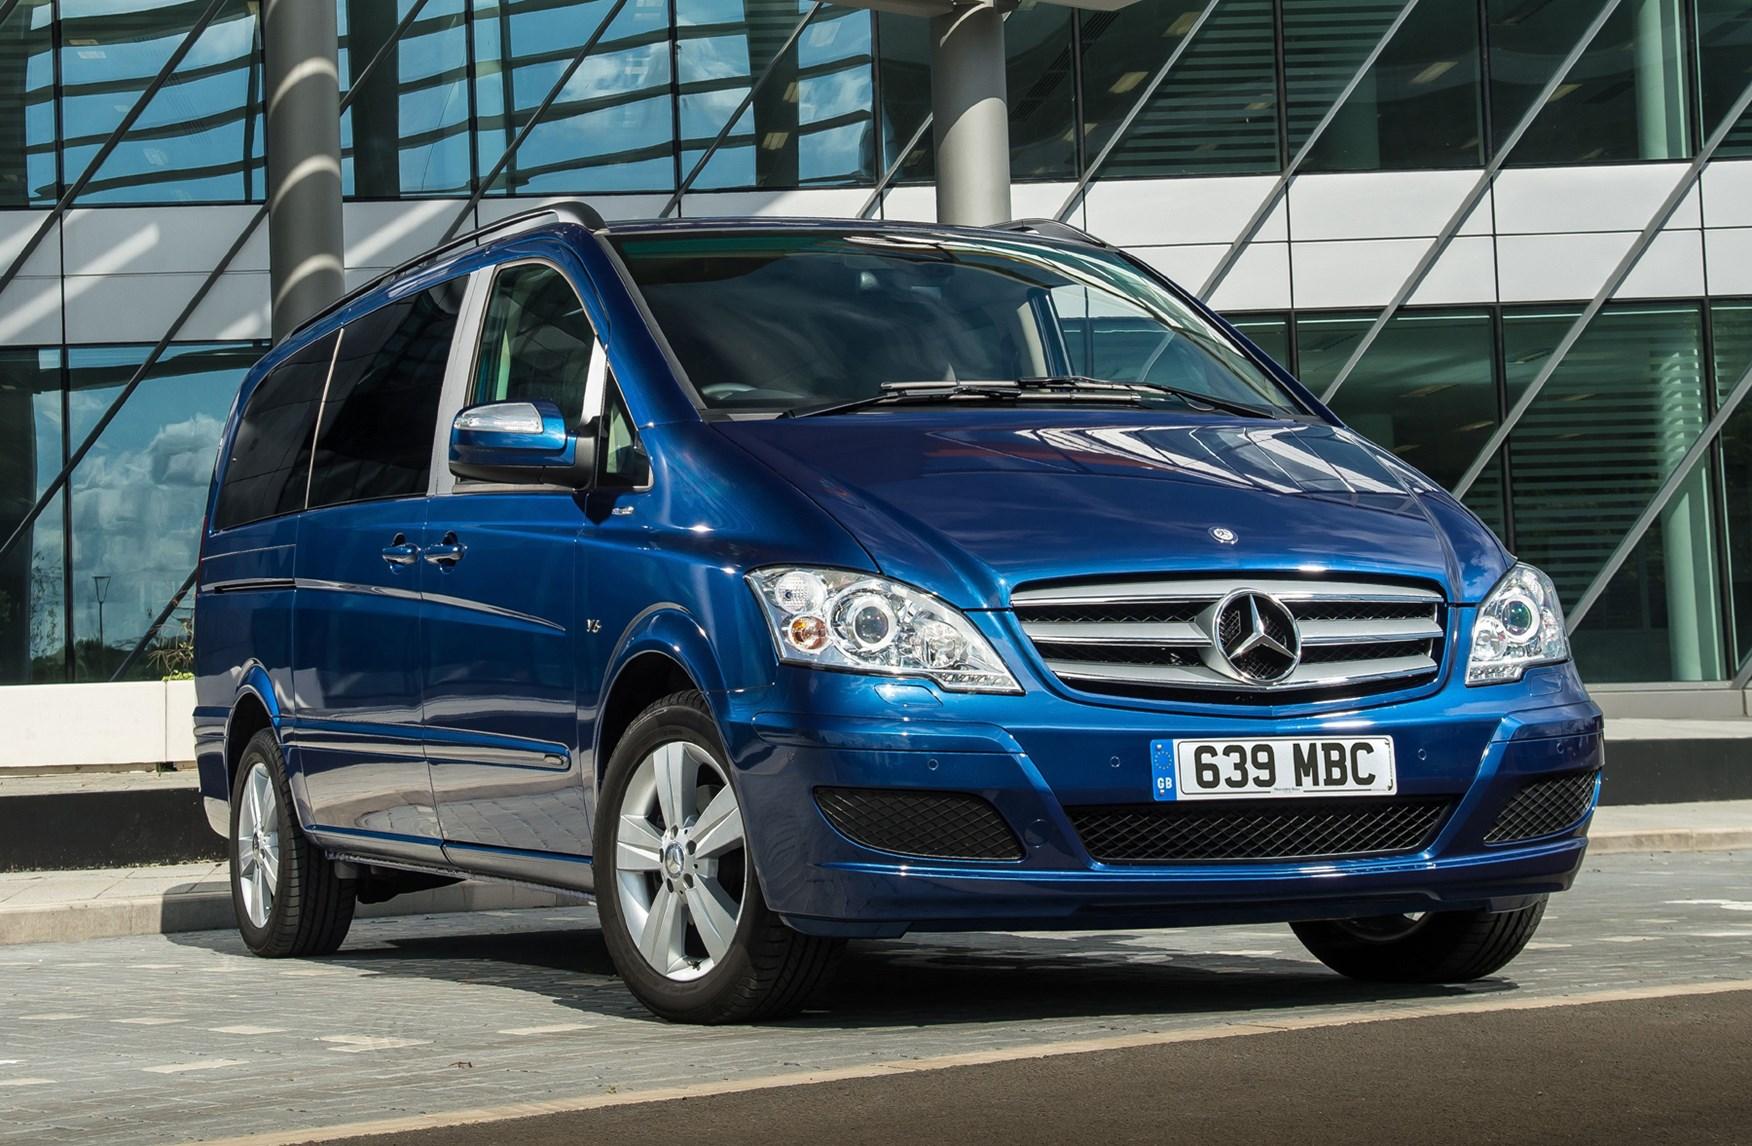 Mercedes Benz Viano Estate Review 2004 2014 Parkers